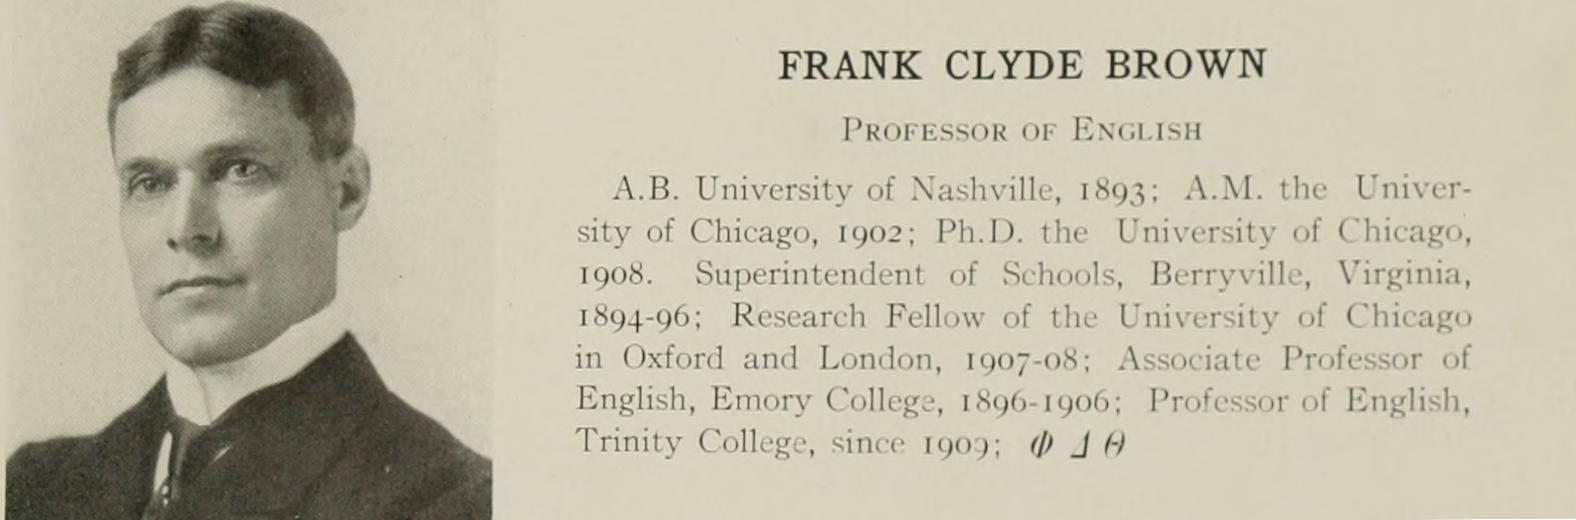 Frank C. Brown in Duke's yearbook  The Chanticleer 1912